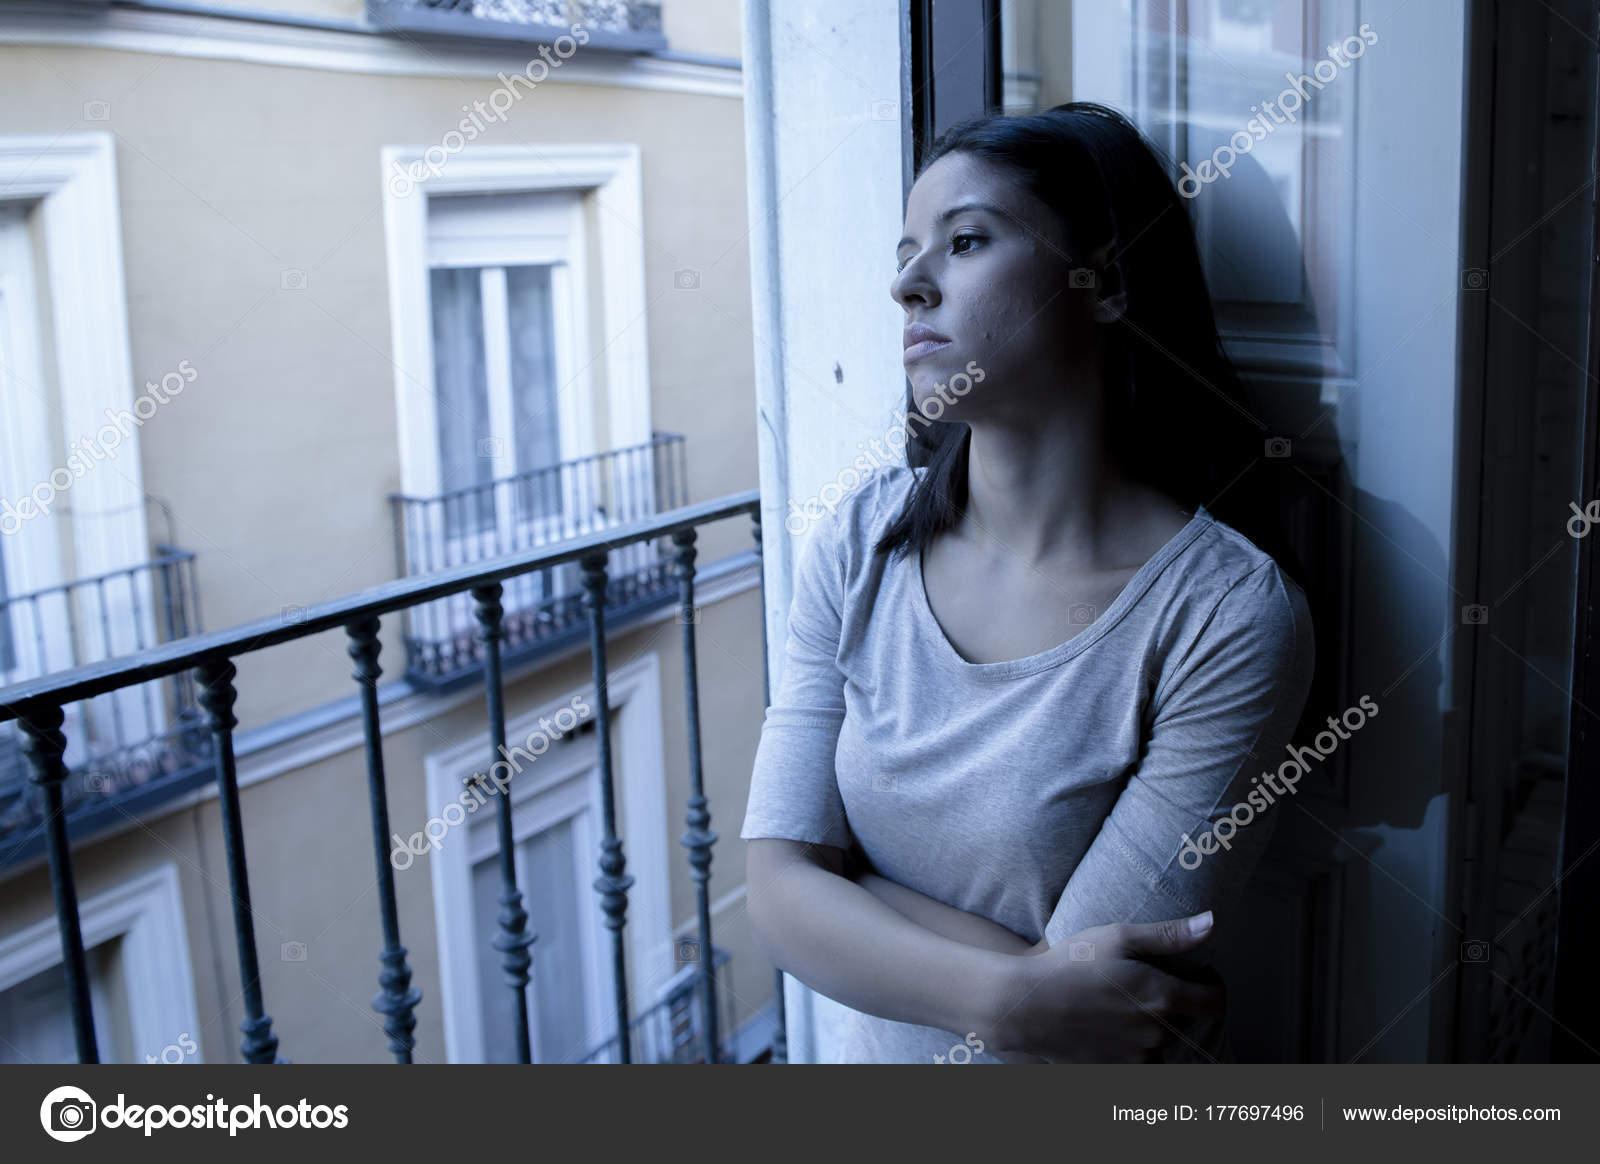 Фото одиноких девушек дома